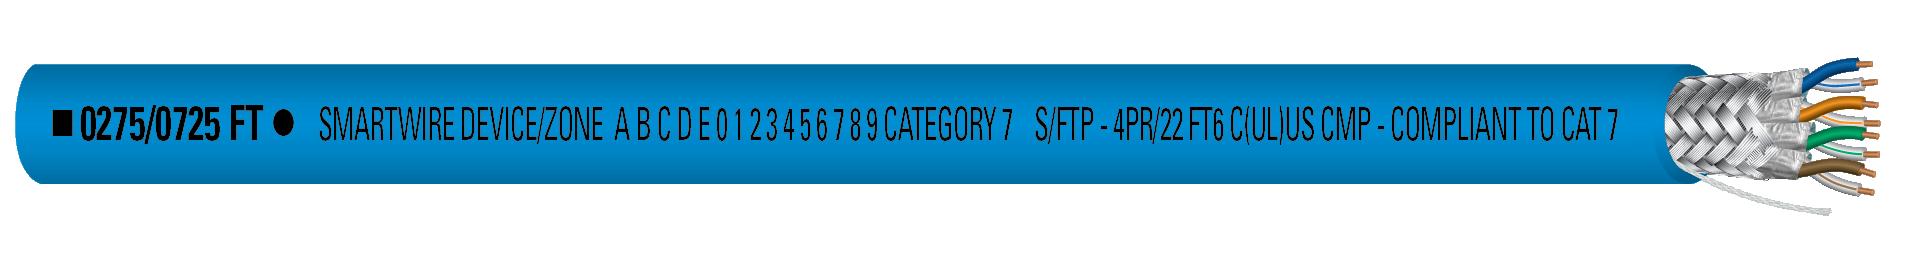 9557619